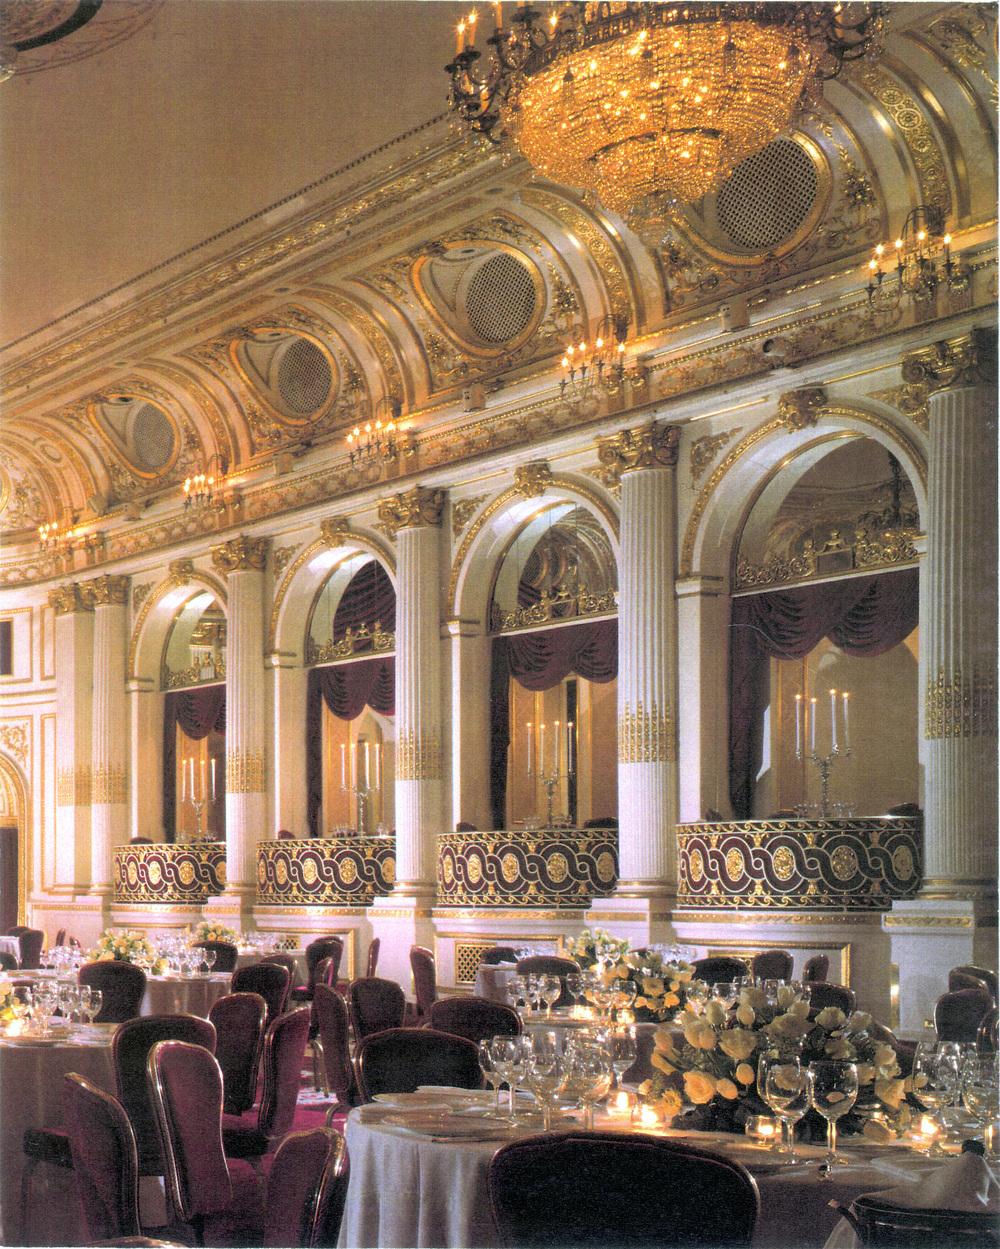 The Plaza Hotel Restoration